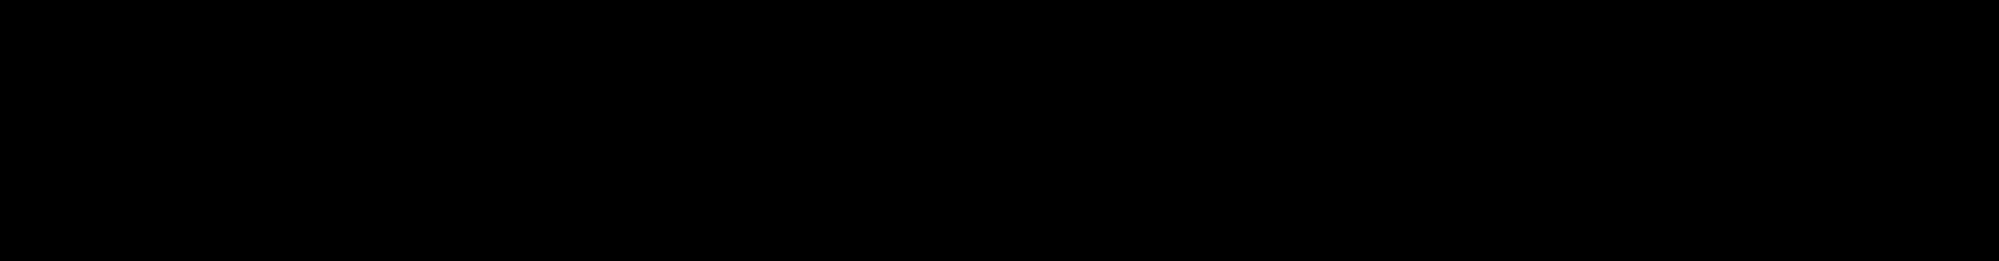 image171.png